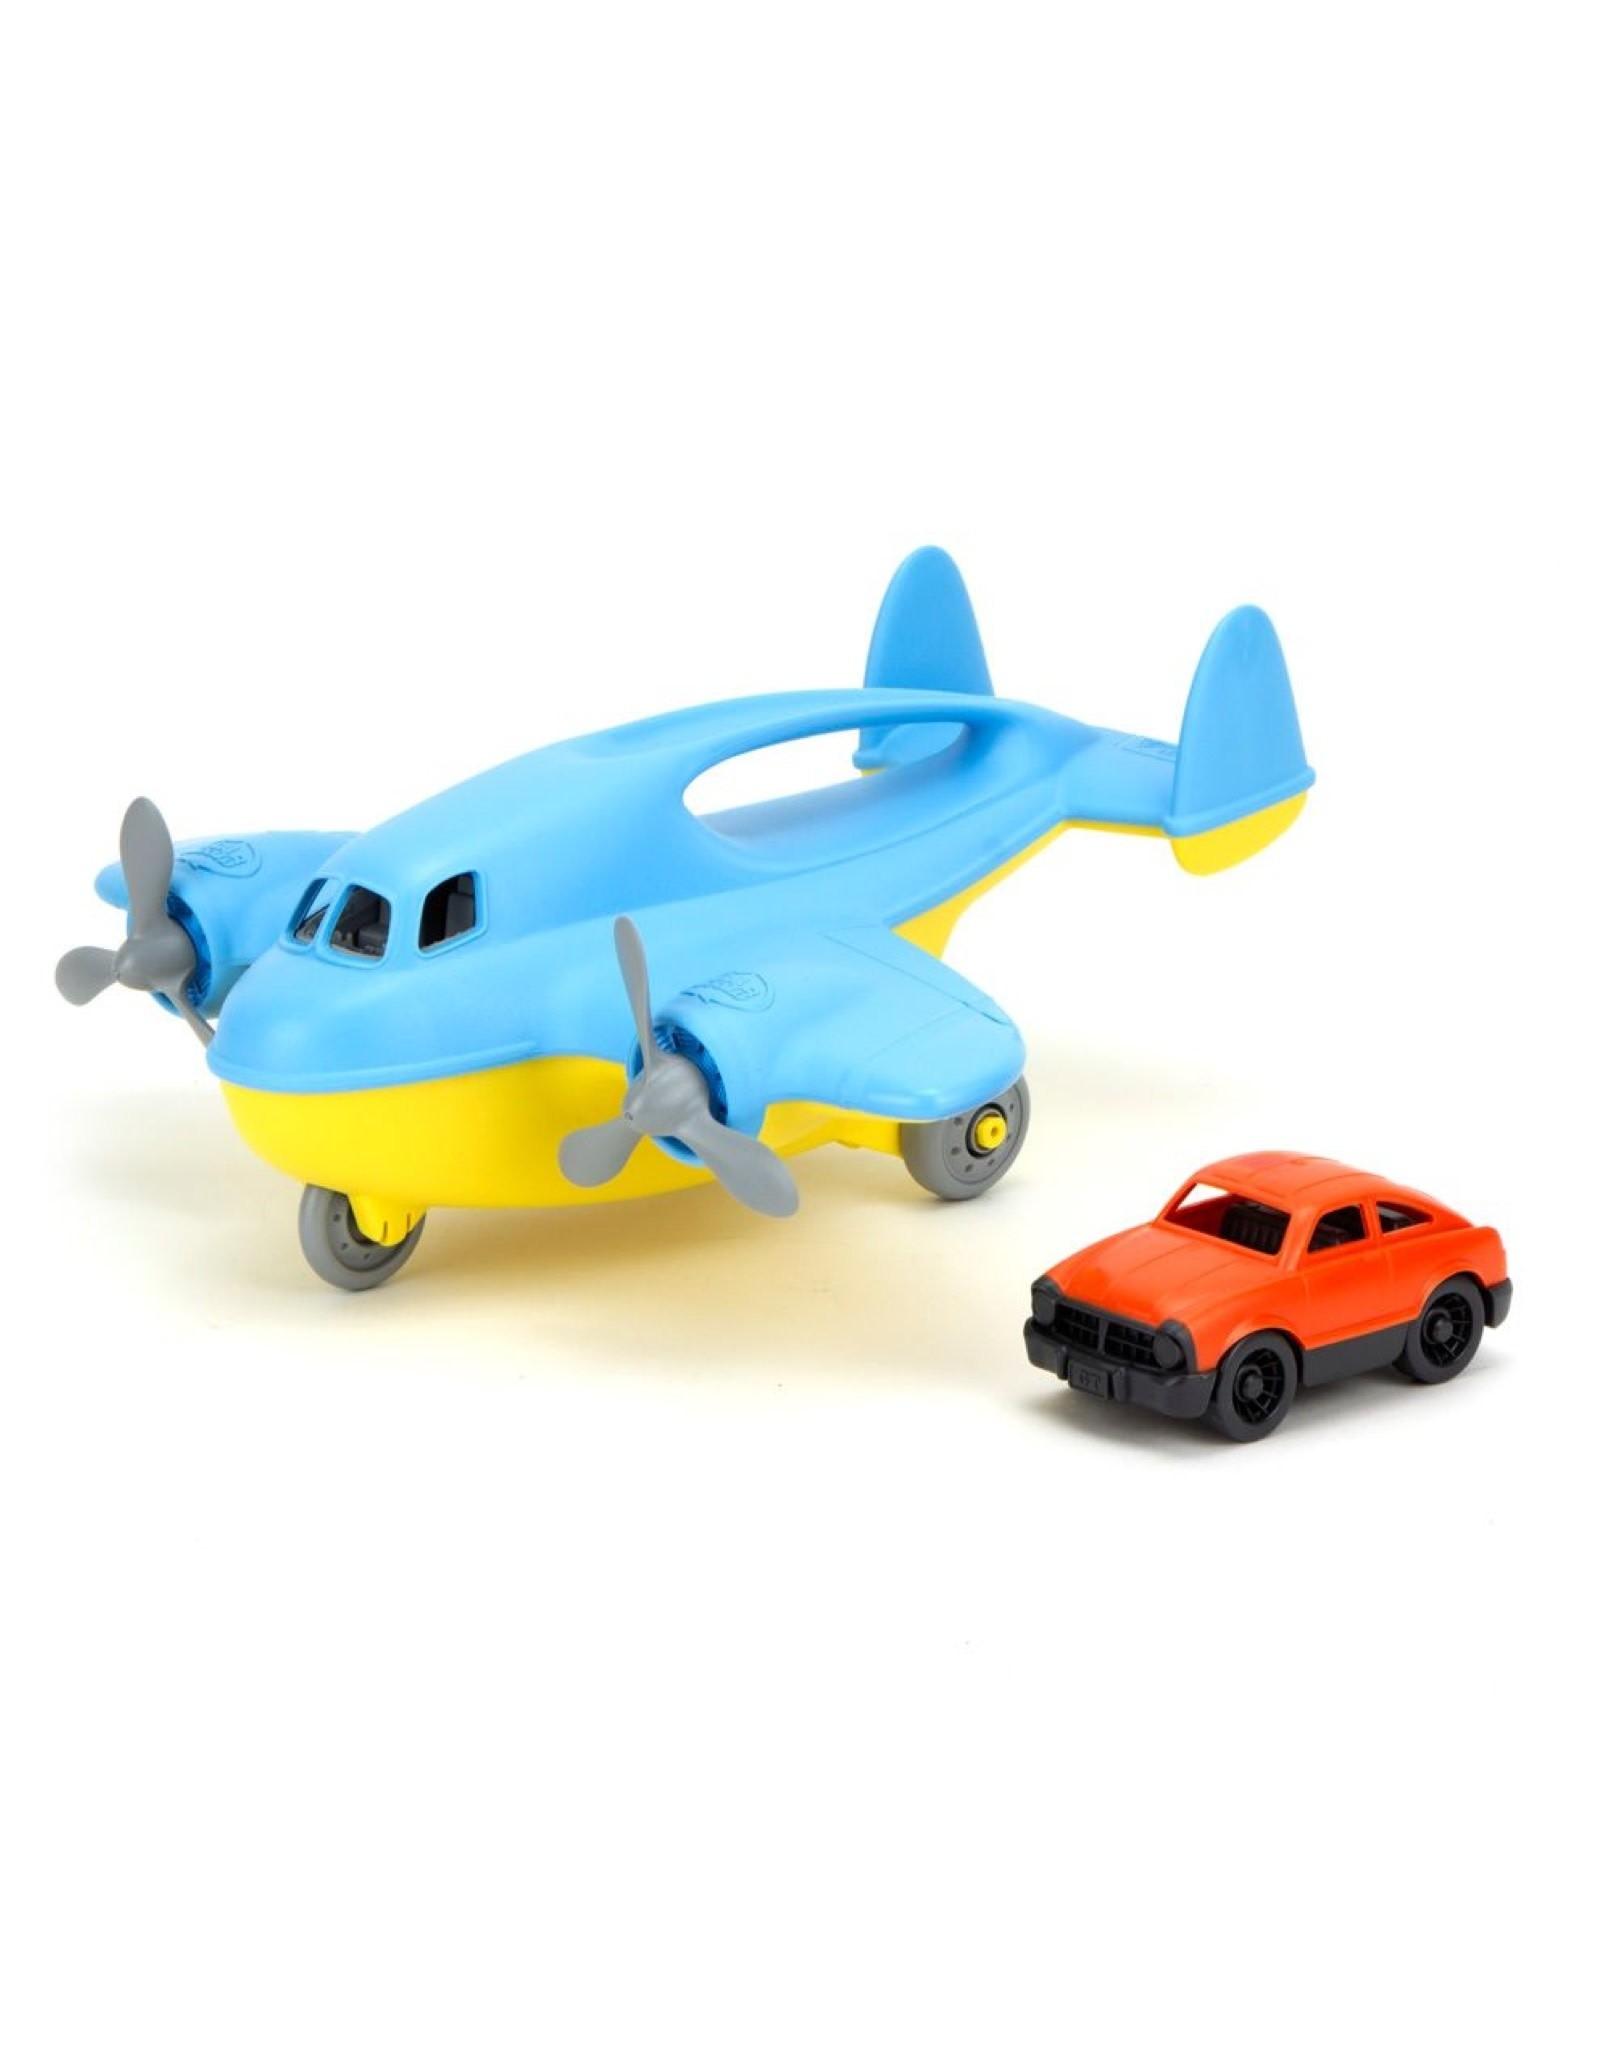 Green Toys Cargo Plane Blue